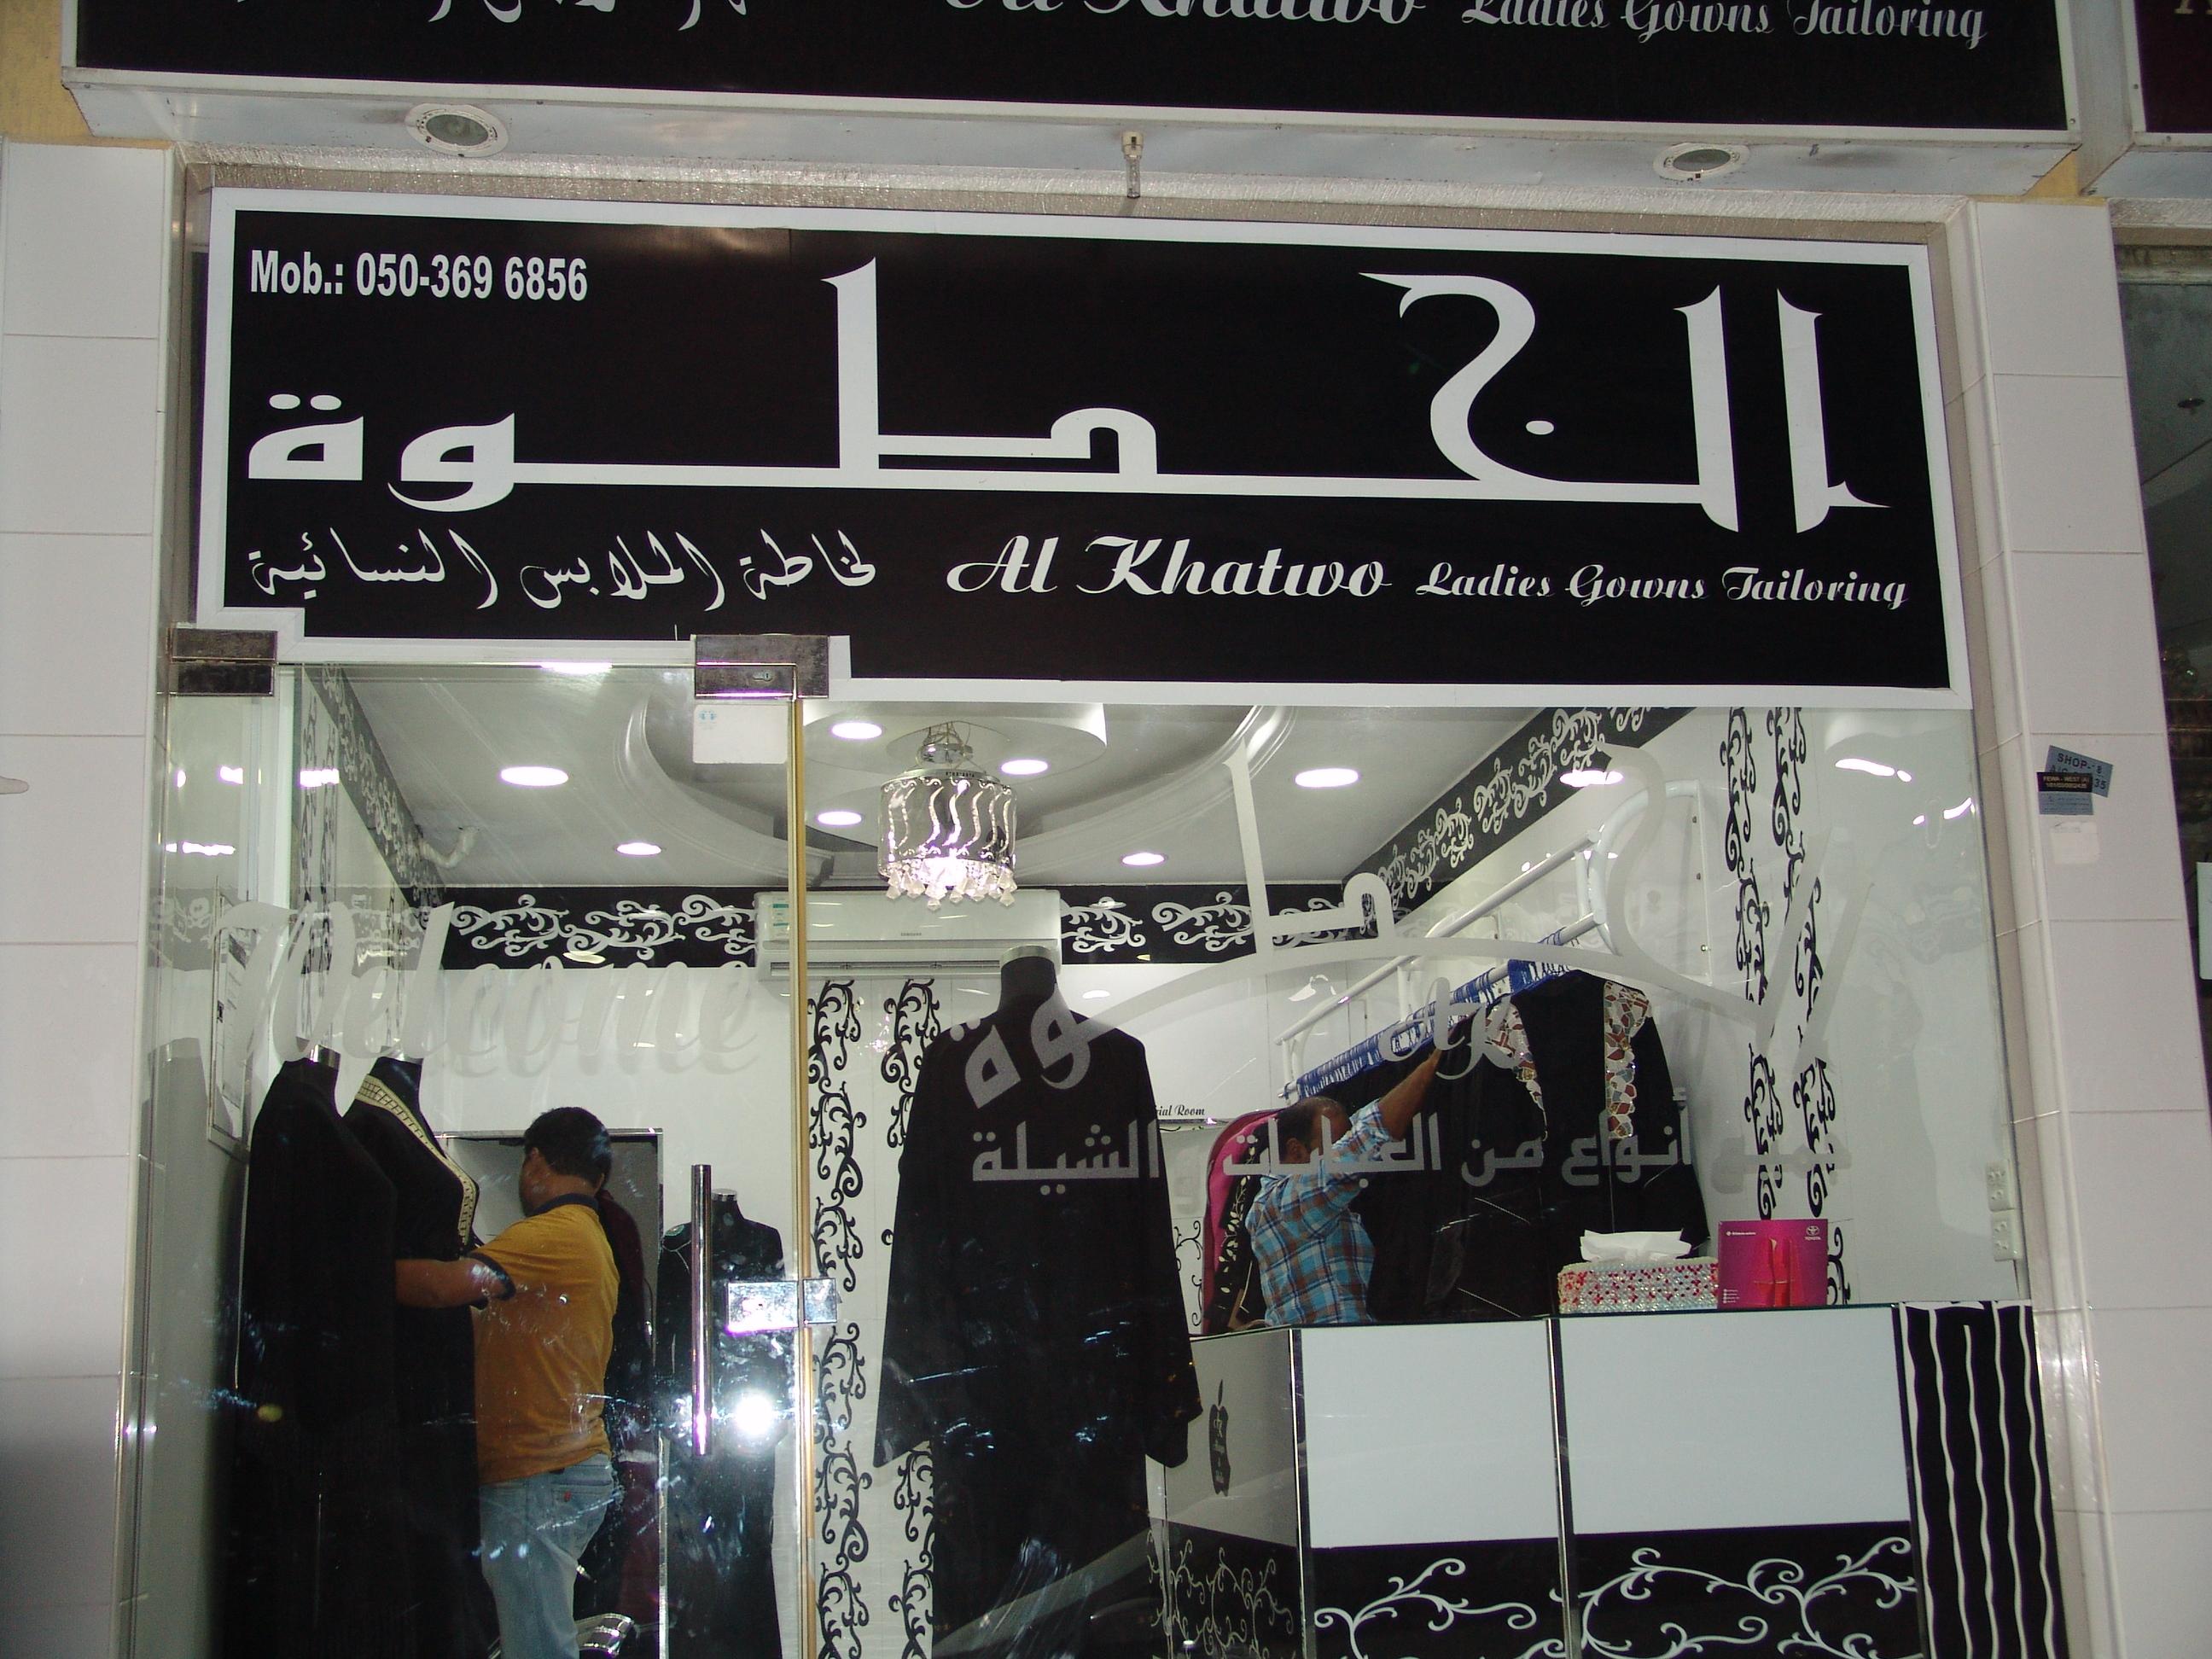 Al Khatwa Ladies Garment Tailoring - DSC01135.JPG